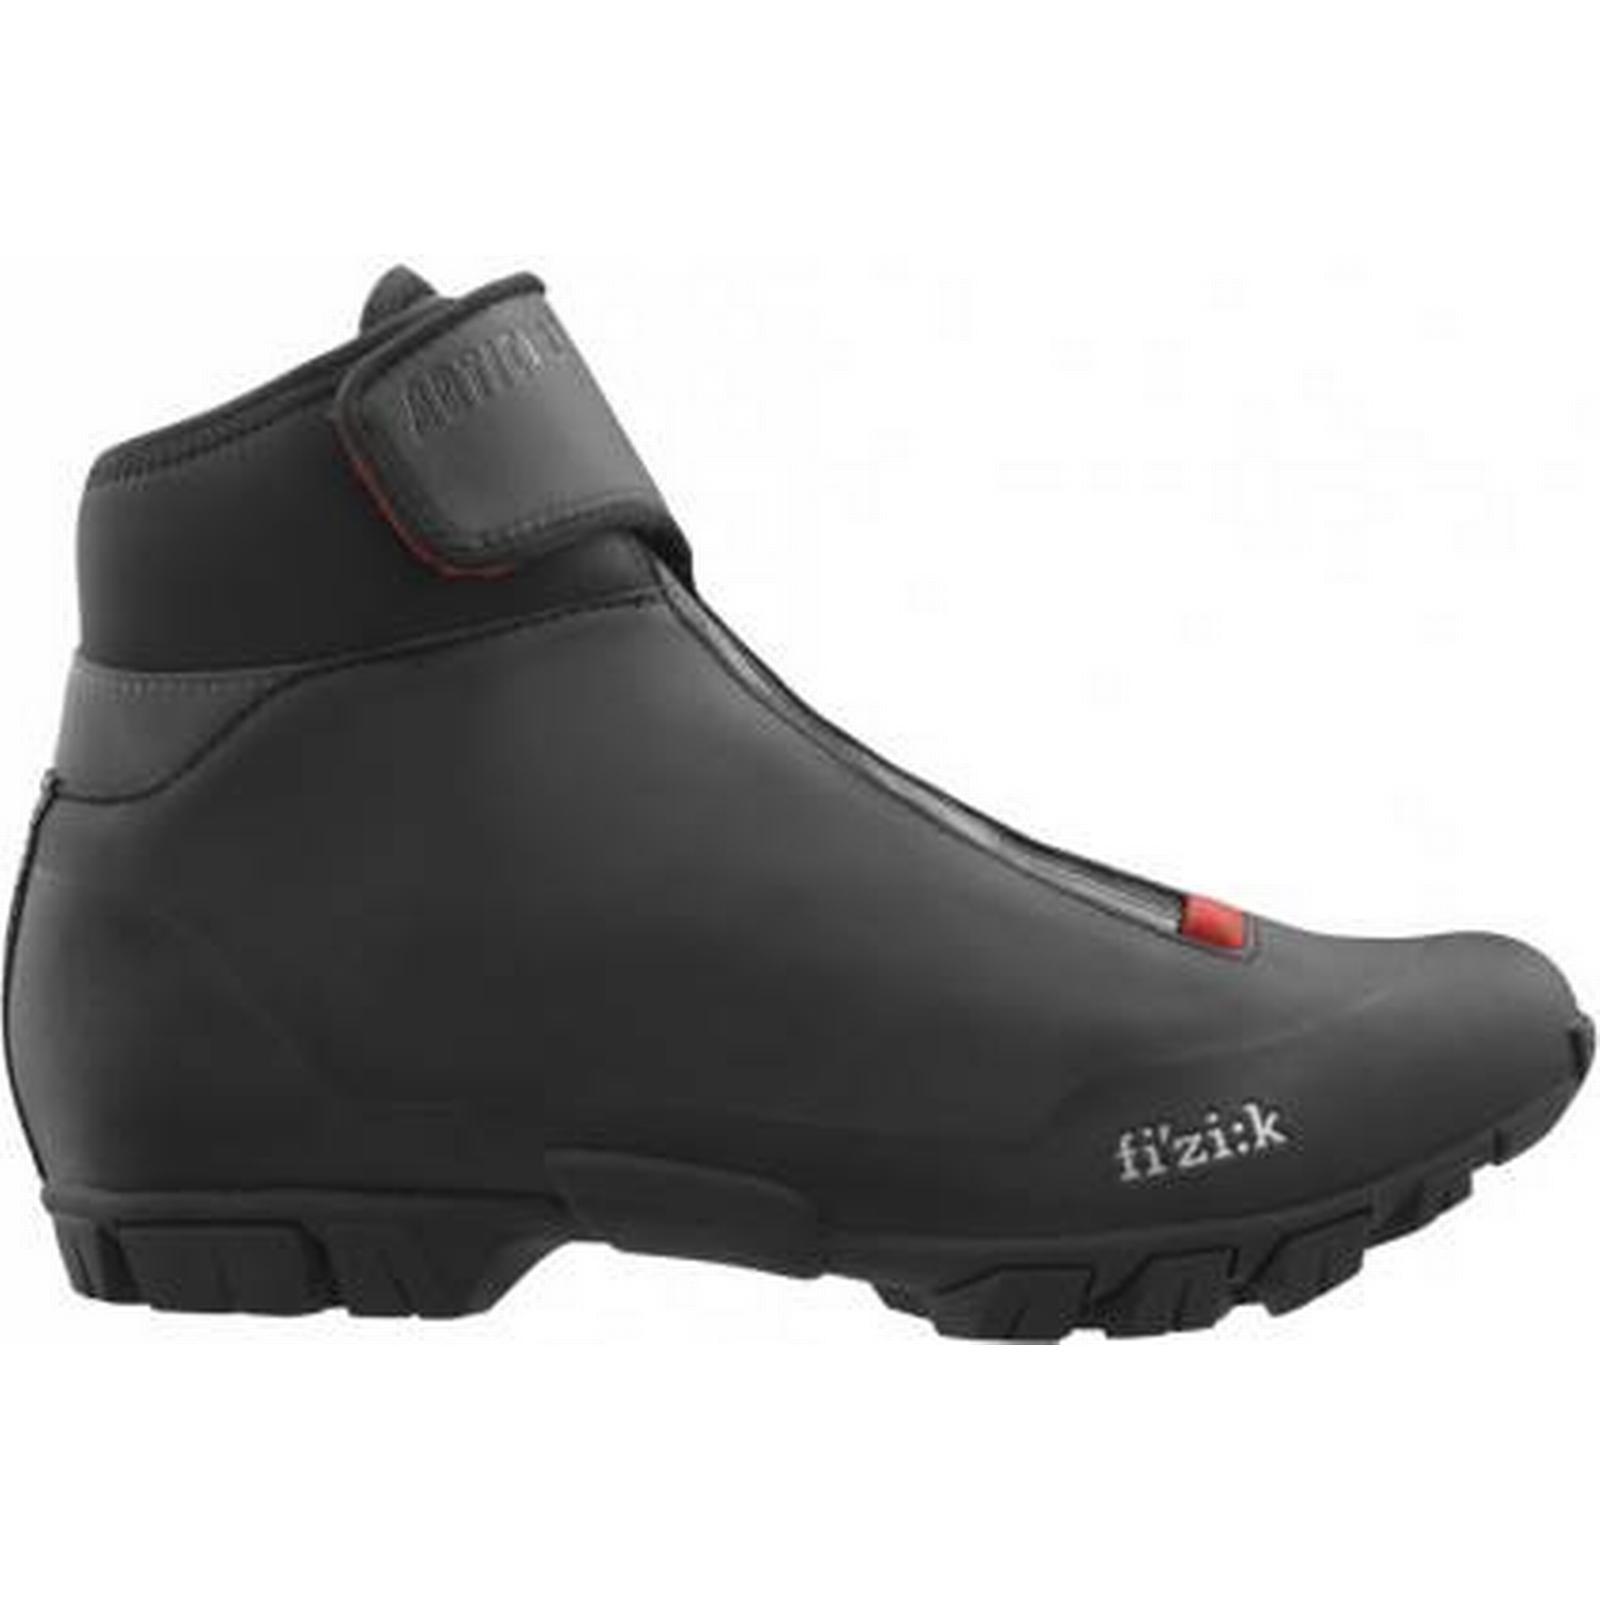 Fizik X5 Artica Black Mountain Bike Shoes - 2018 - Black Artica / EU46 511b87